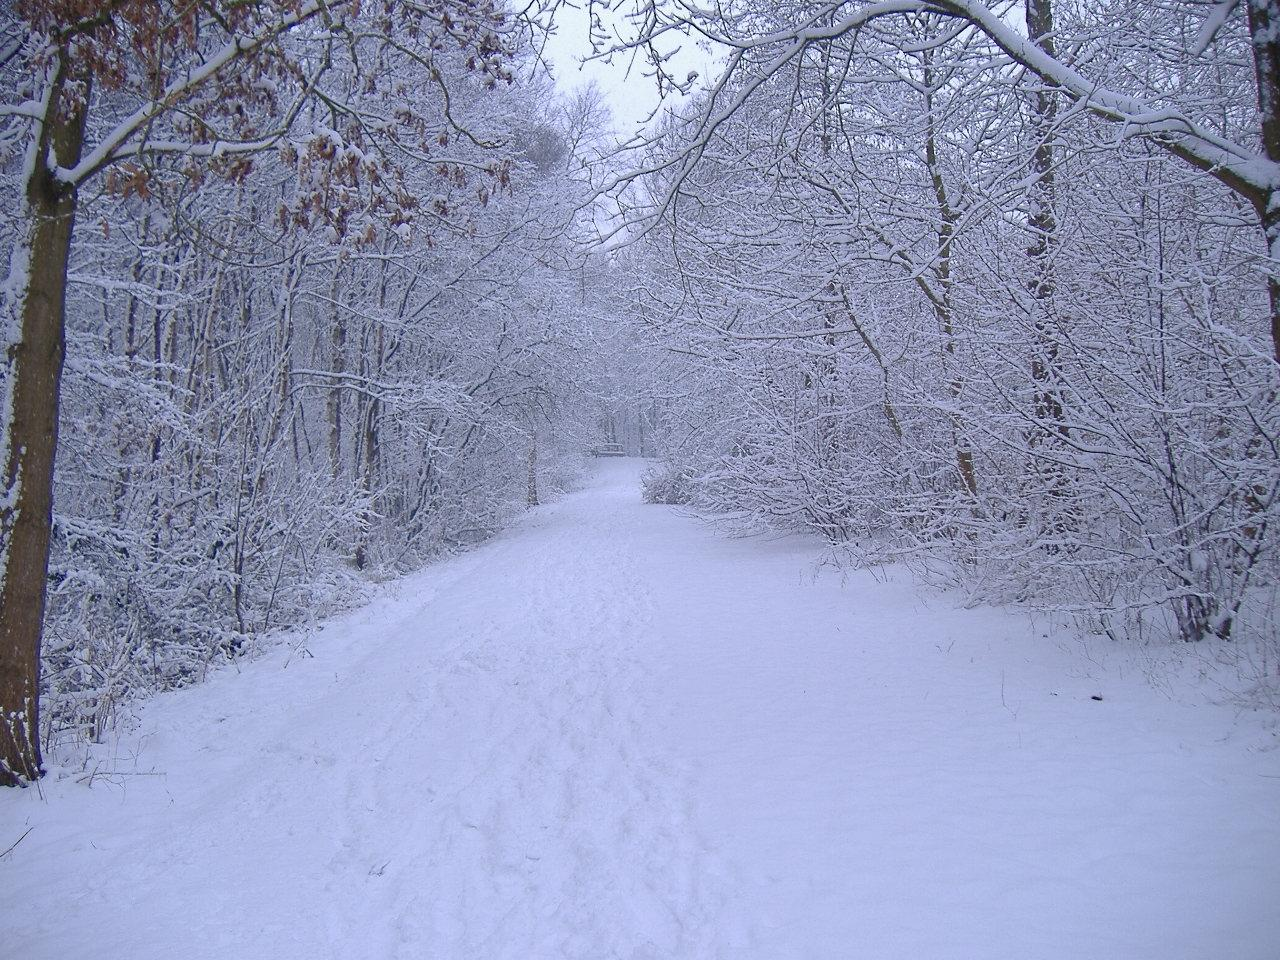 Download Winter Scene wallpaper Winter scene 27 1280x960